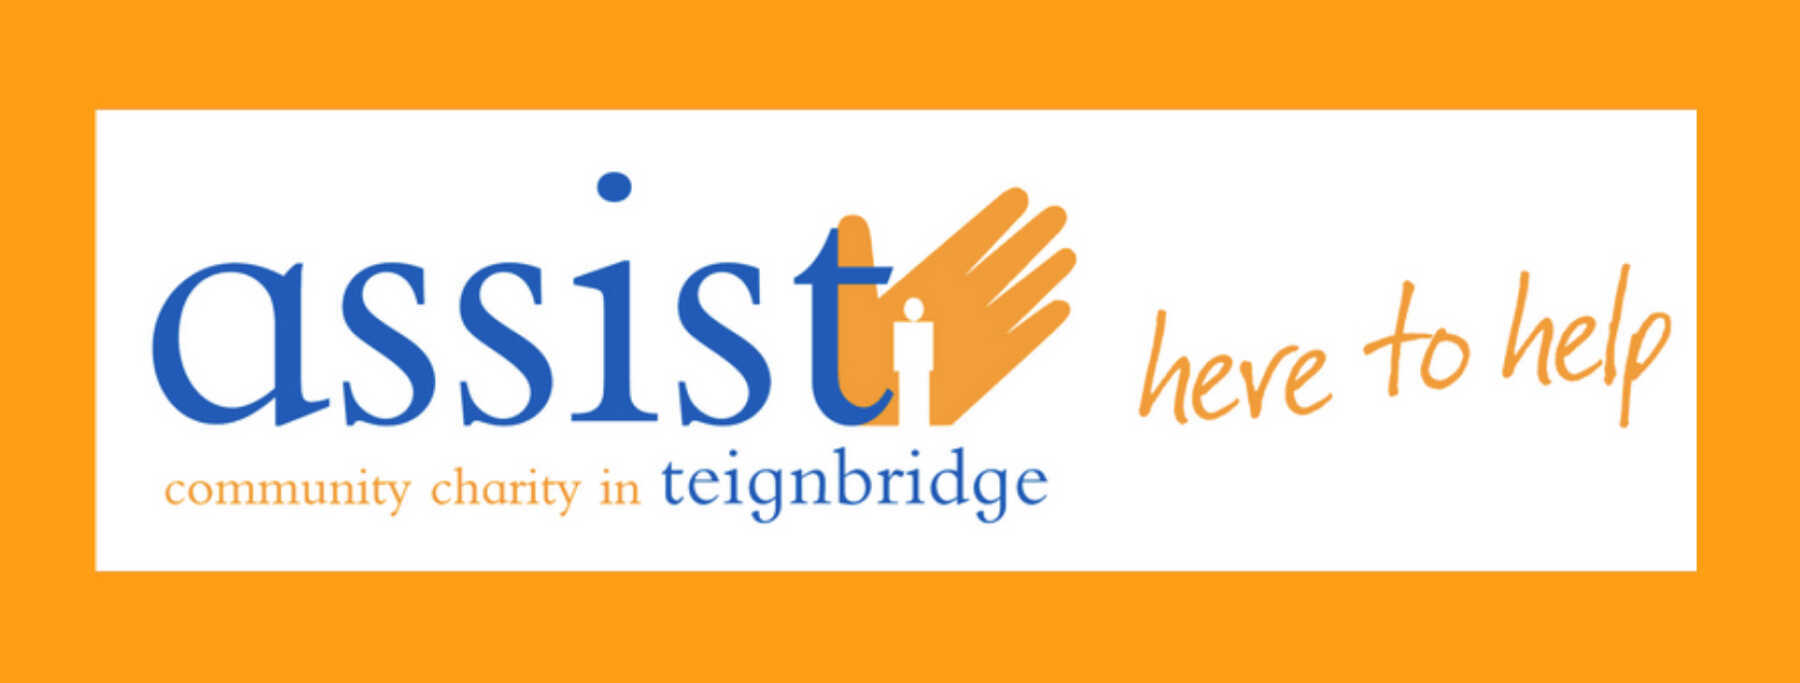 Featured Image for Assist Teignbridge